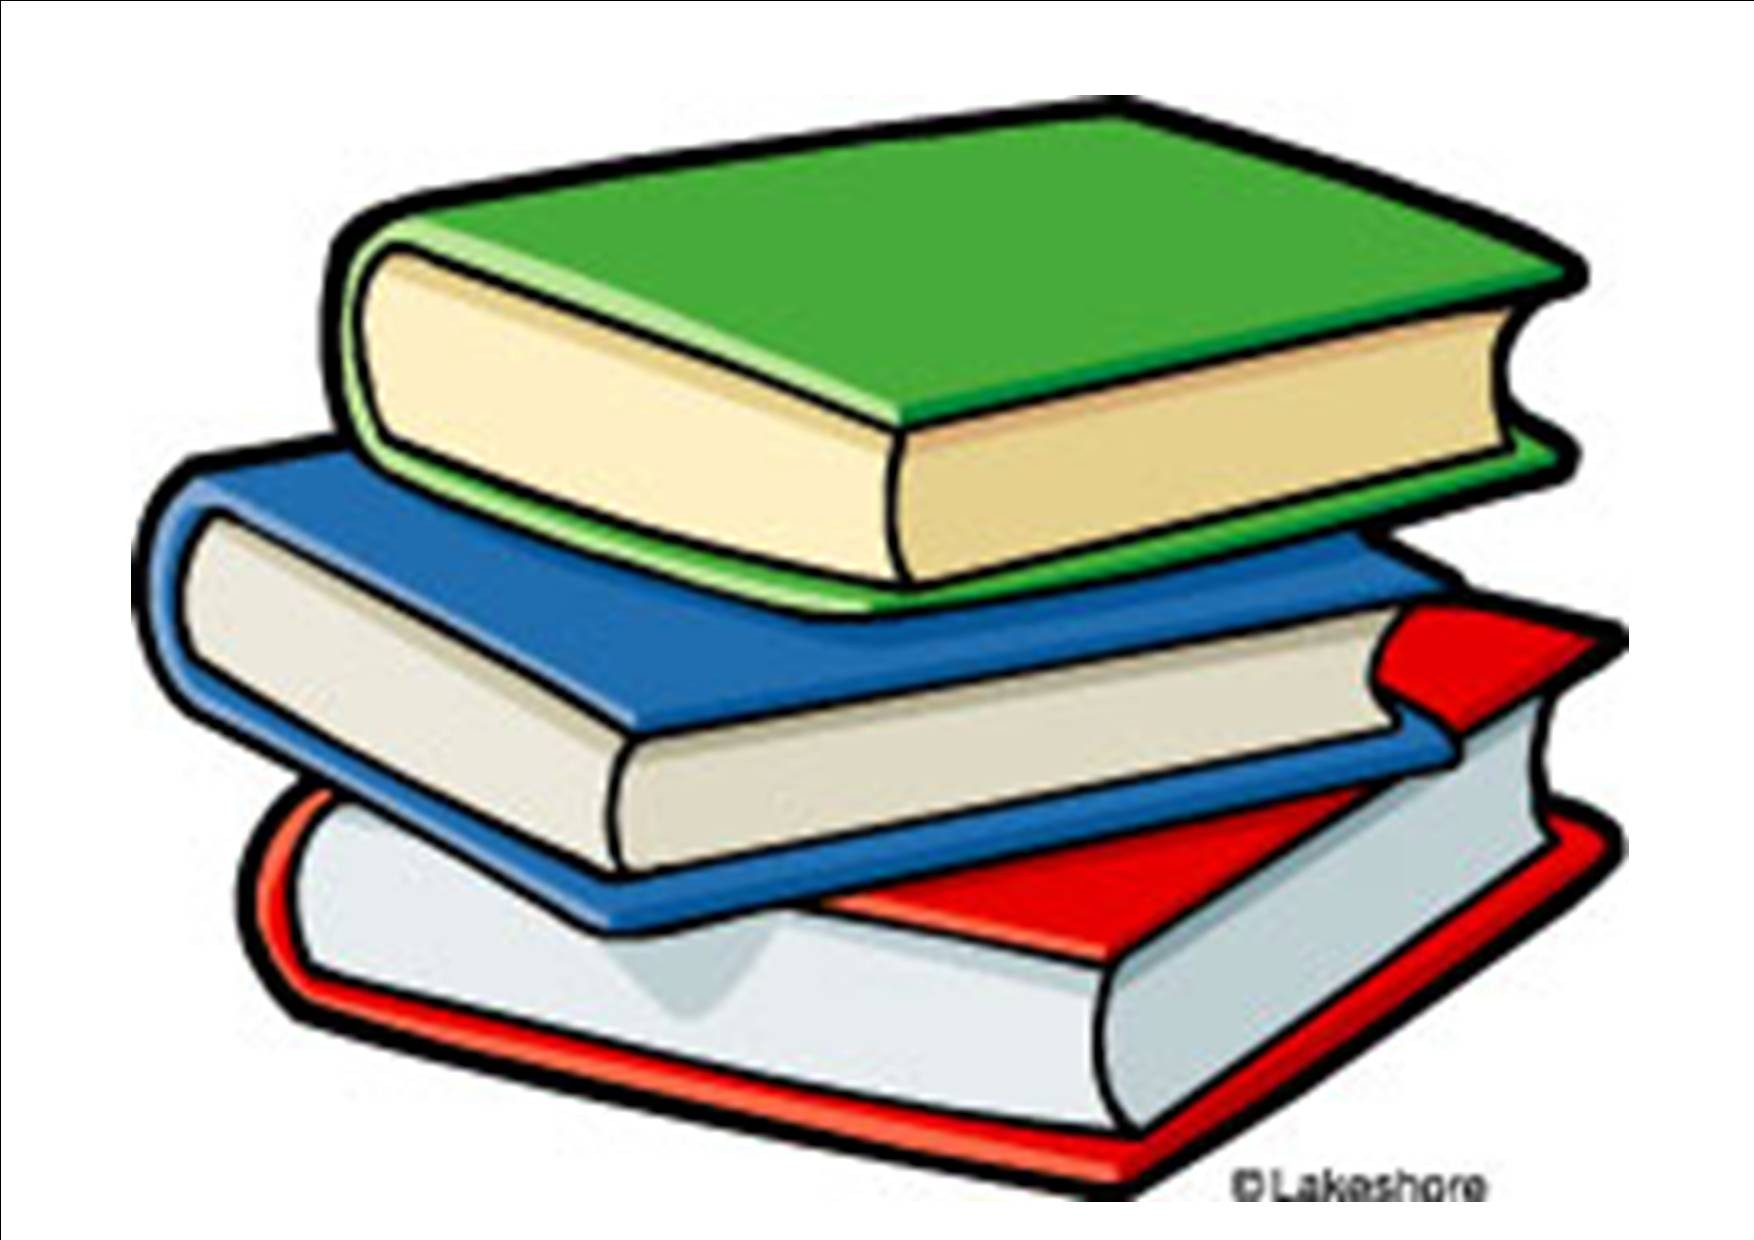 clipart free download Clip clipart teacher supply. Free teaching supplies cliparts.